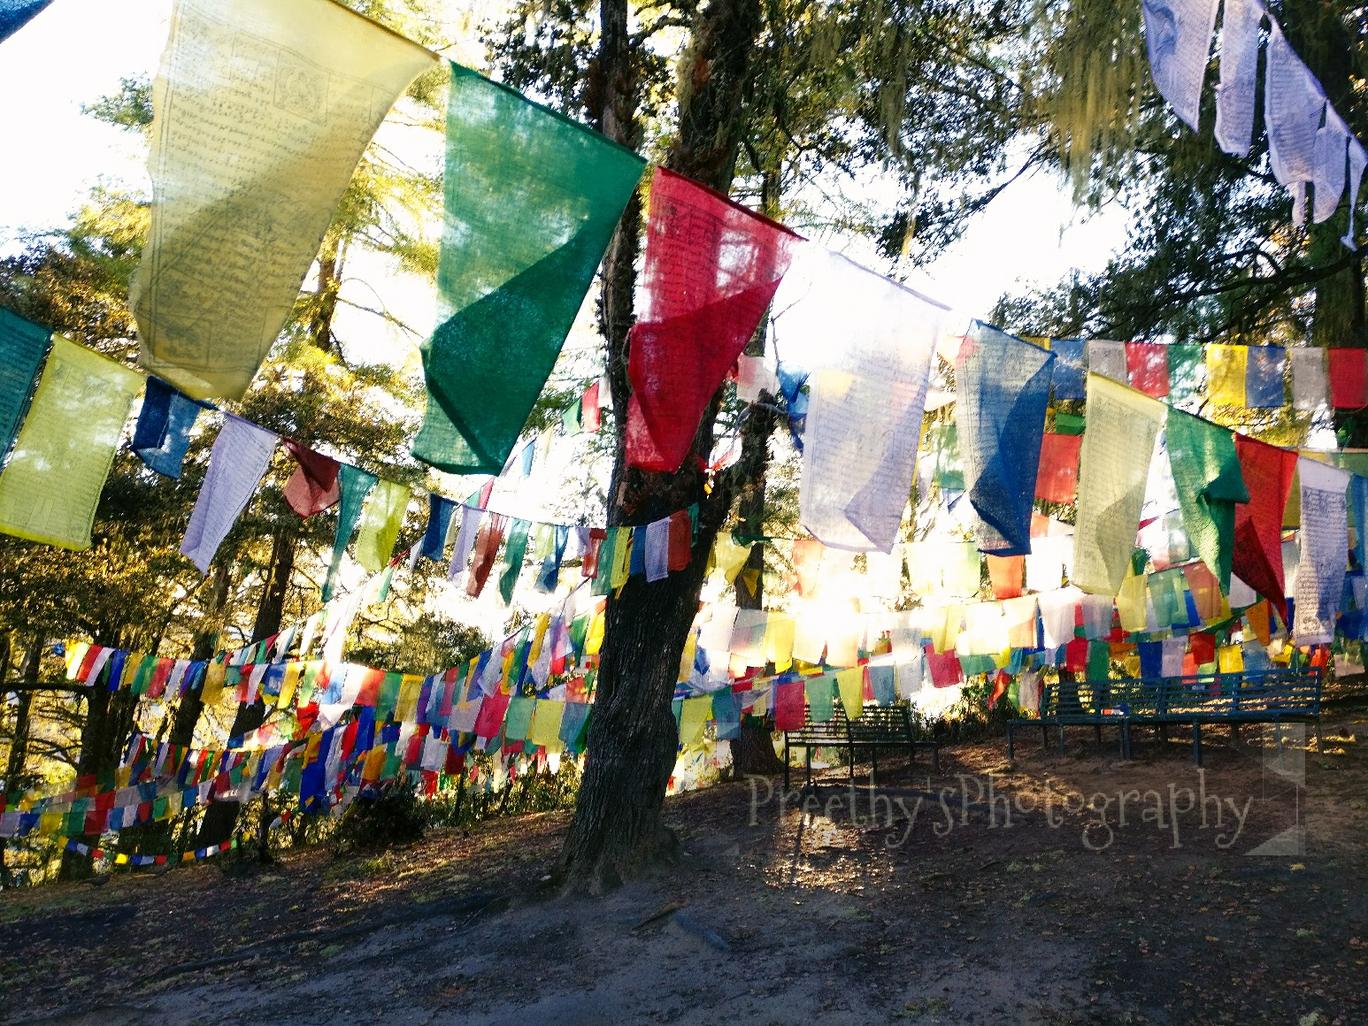 Photo of Bhutan By preethy r